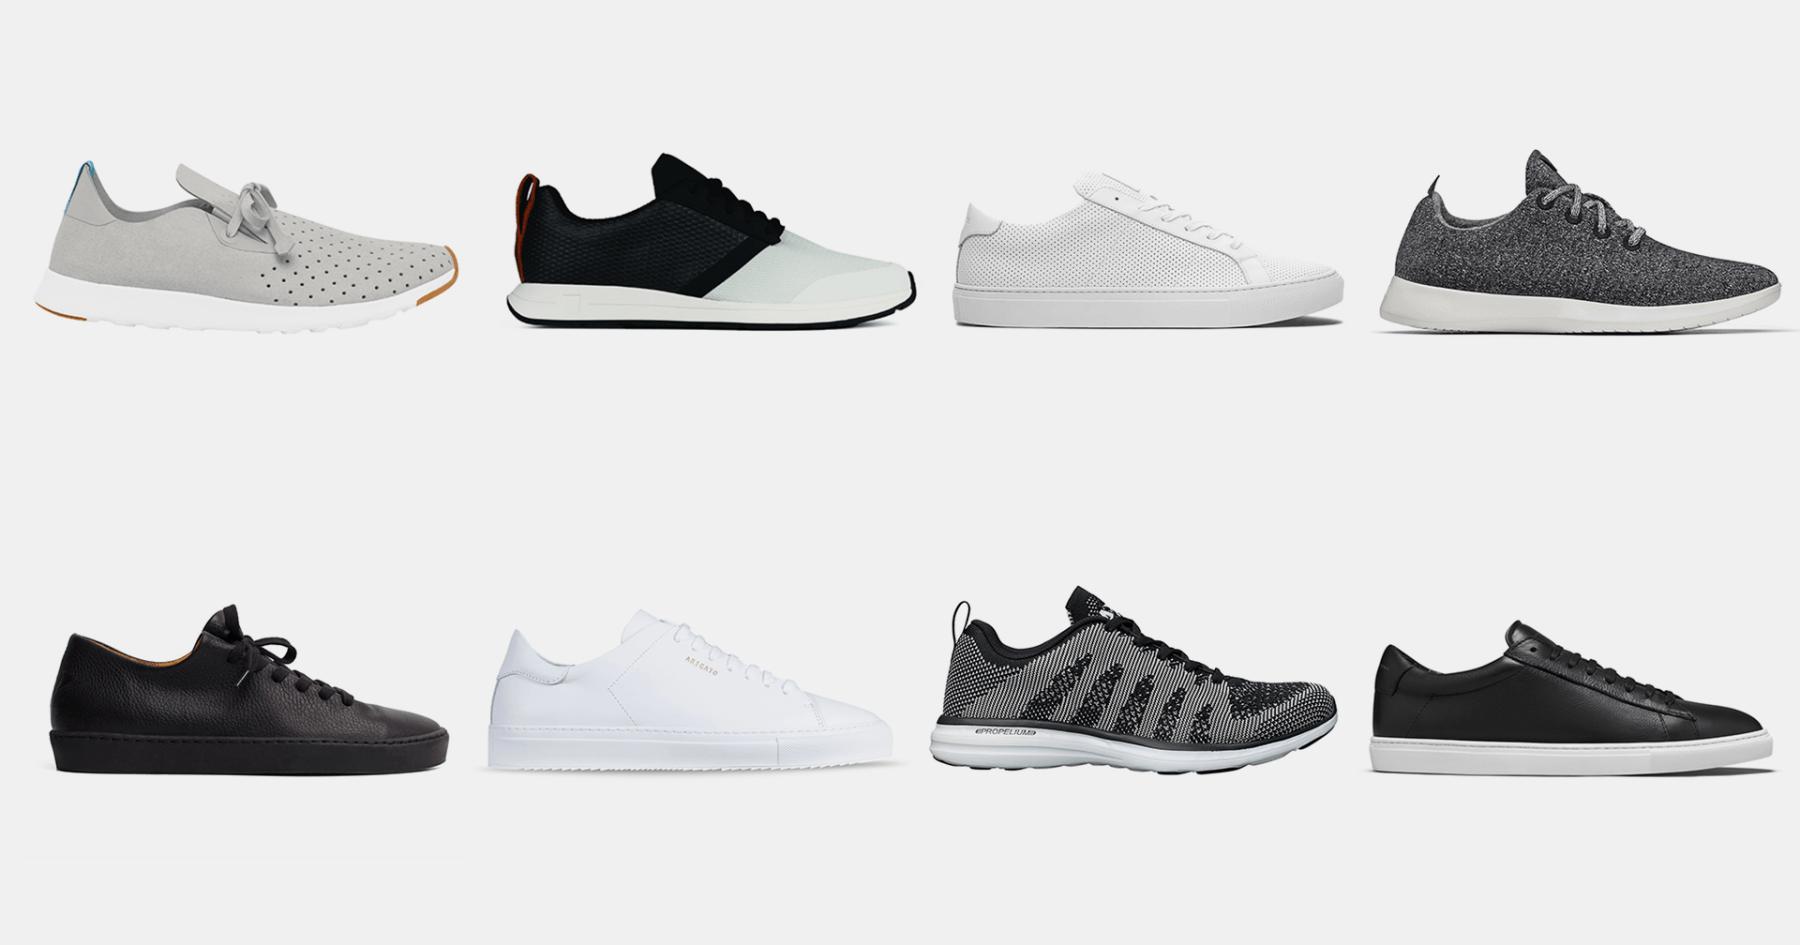 15 New Sneaker Brands Every Guy Should Know InsideHook